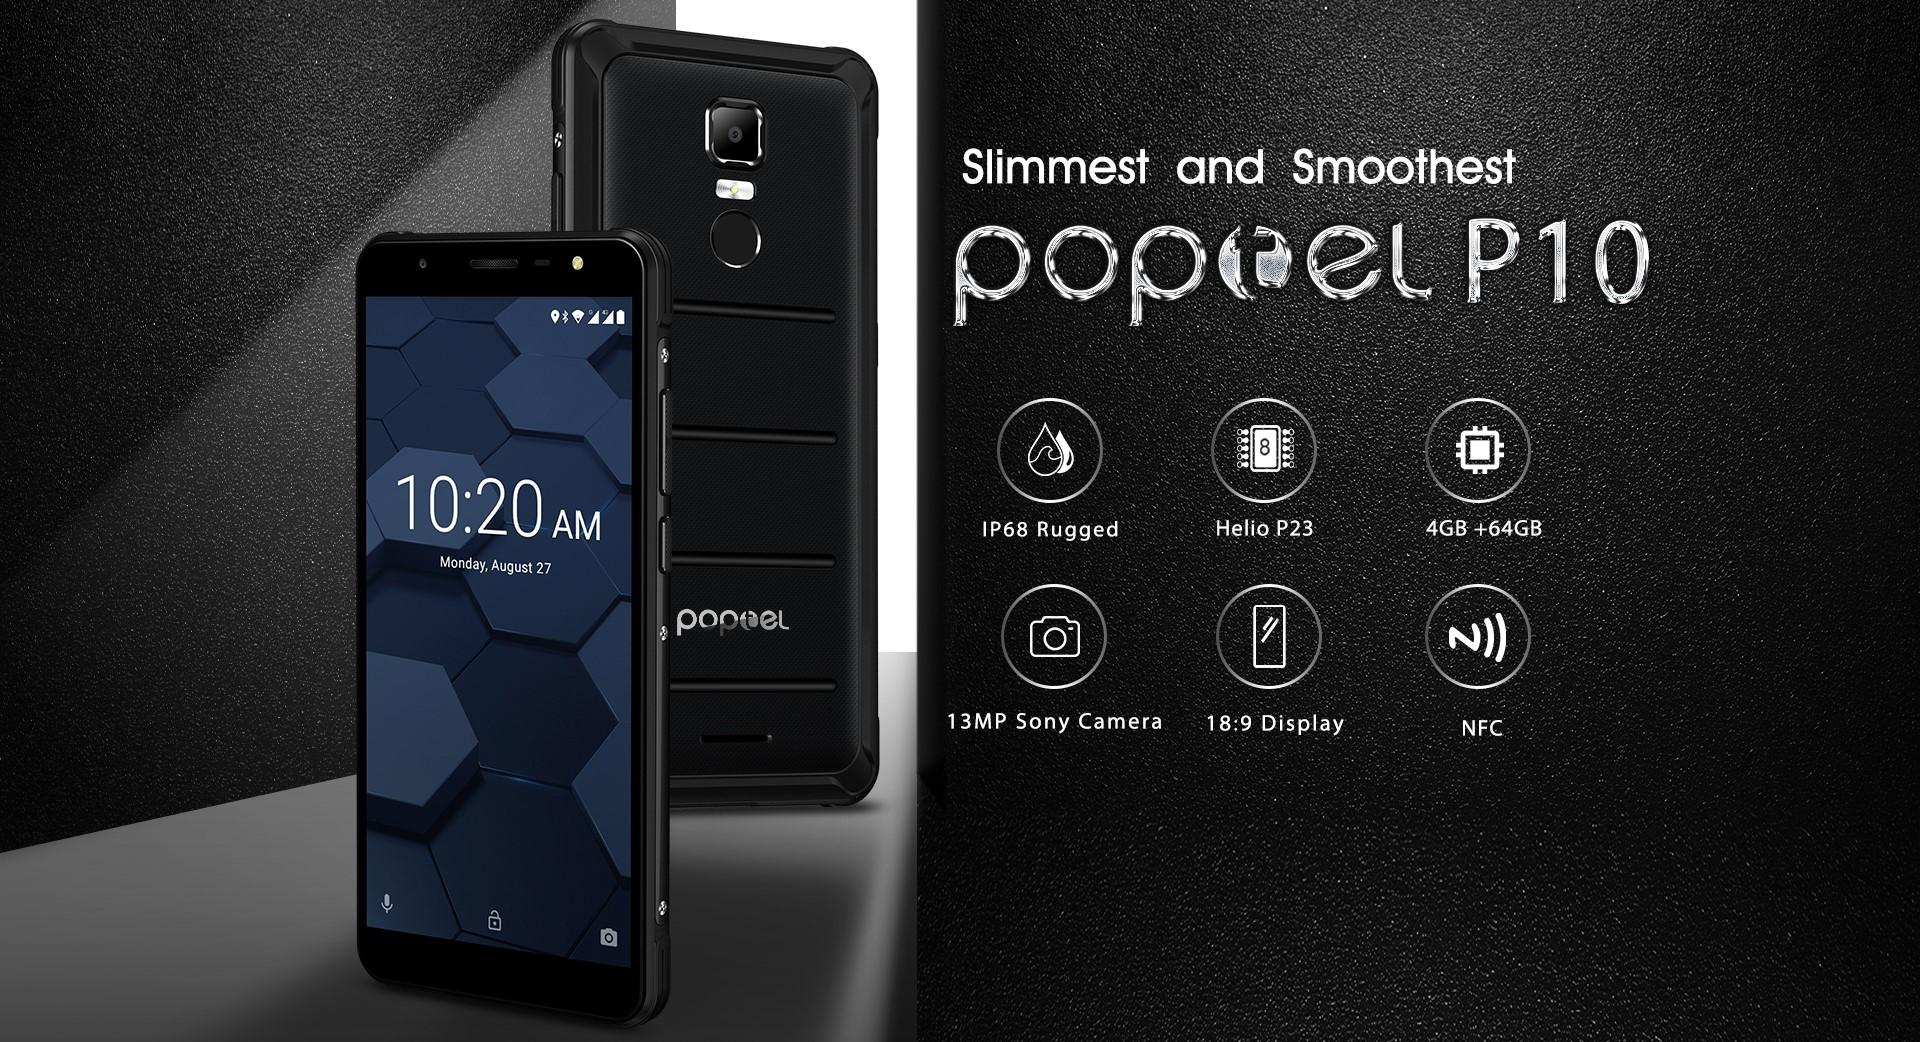 Poptel P10 Sample